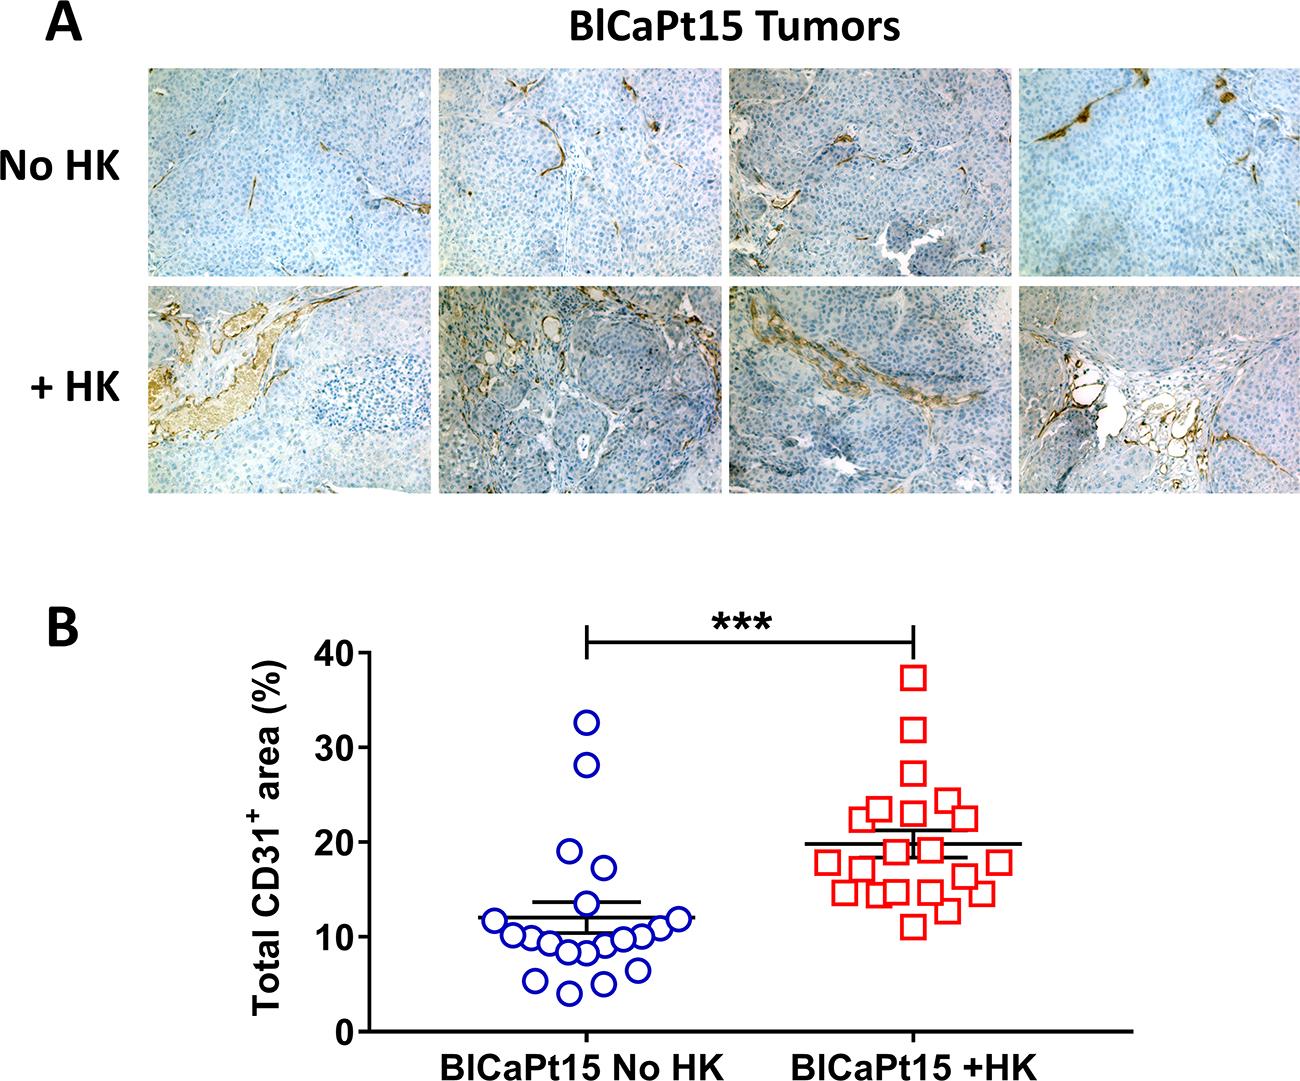 LN stromal HK cells support UCC tumor angiogenesis in the IB model.